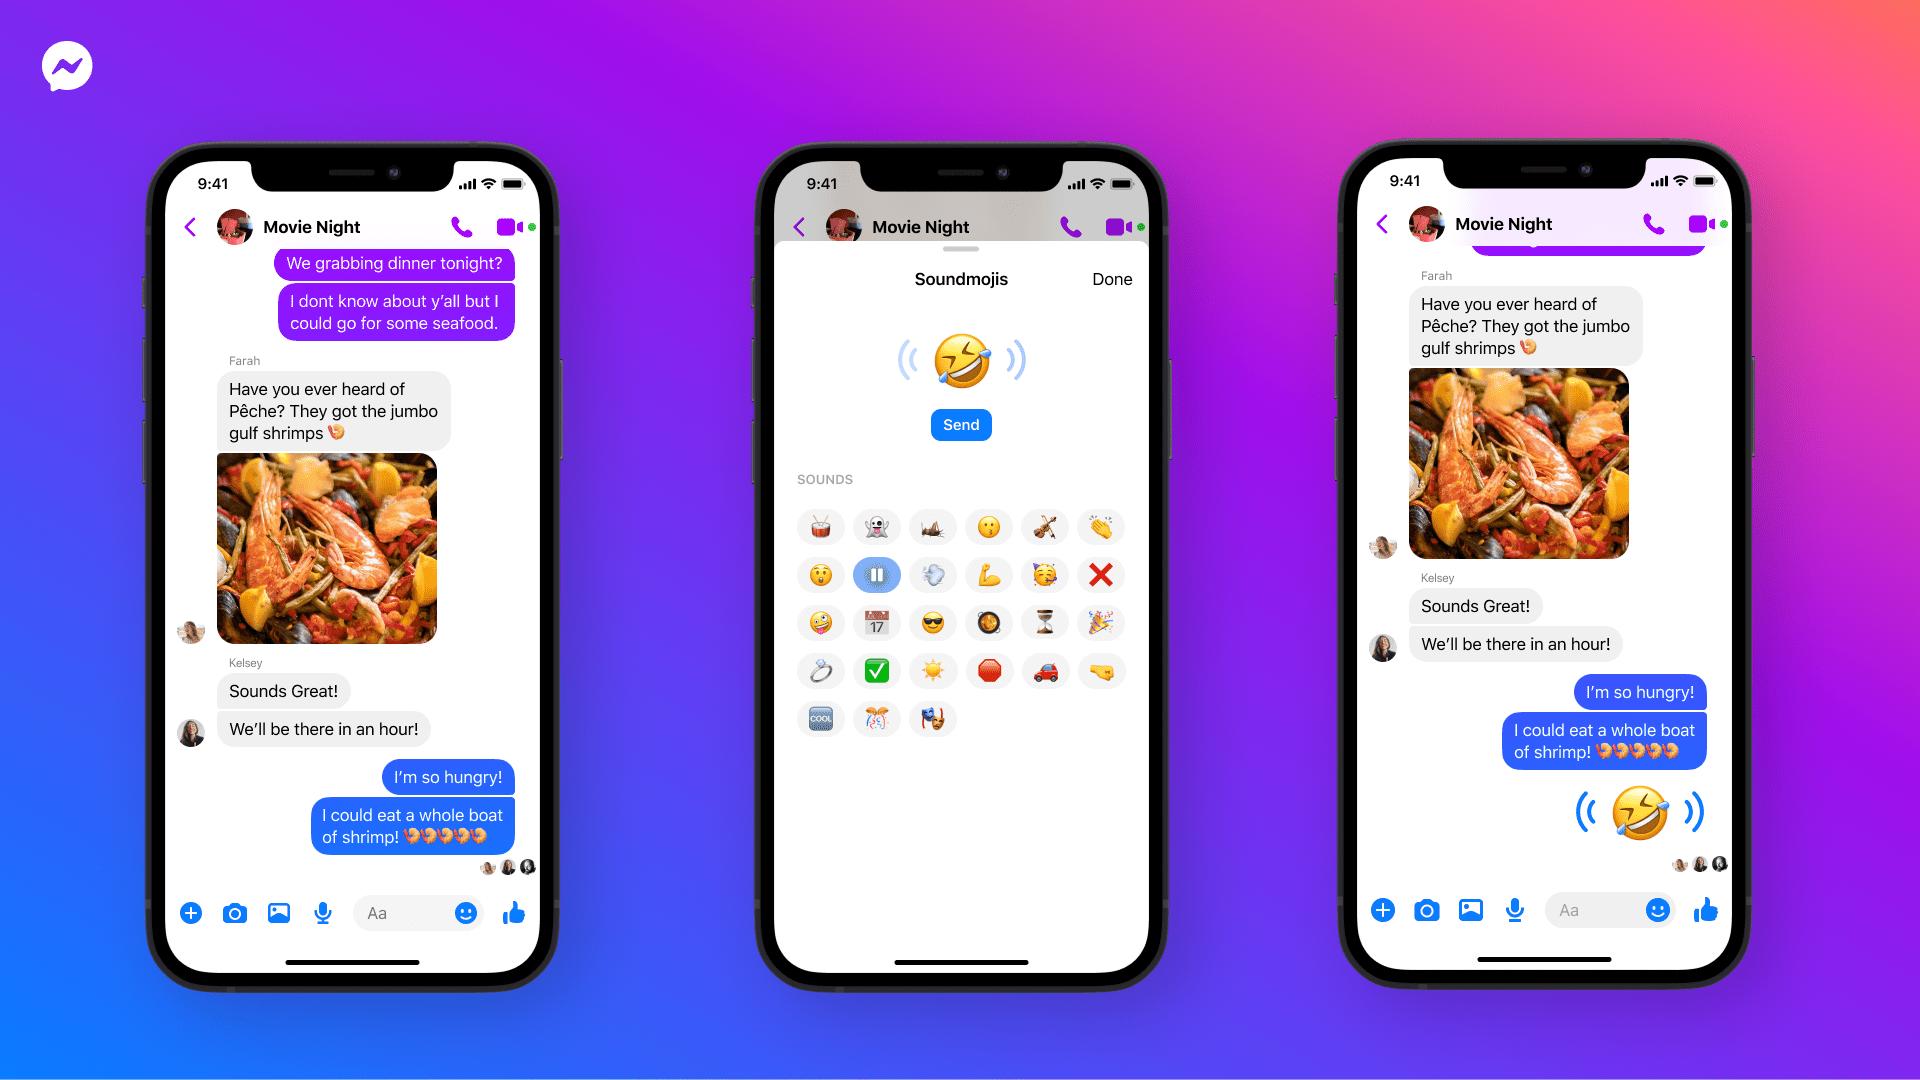 facebook soundmoji in messenger app on iOS